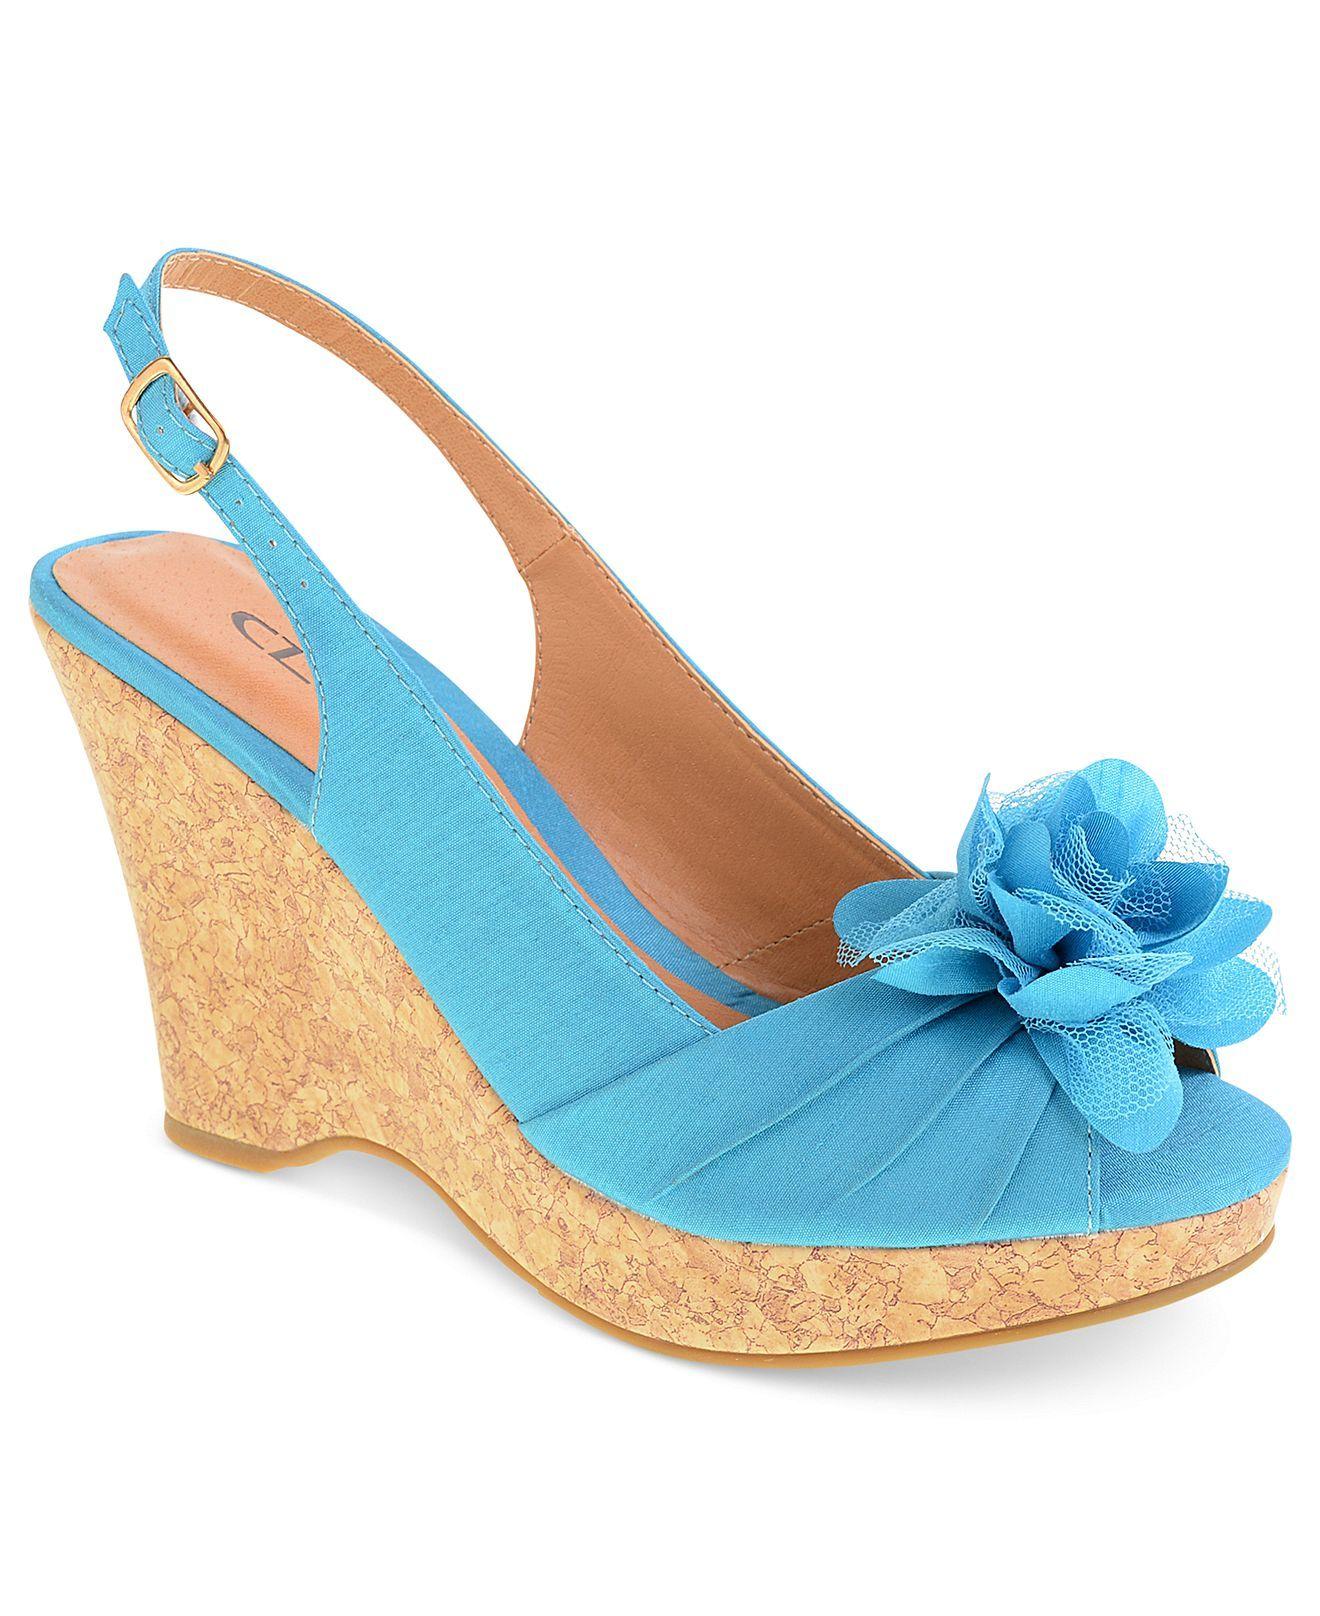 CL by Laundry Shoes, Ilena3 Platform Wedge Sandals - All Women's Shoes - Shoes - Macy's